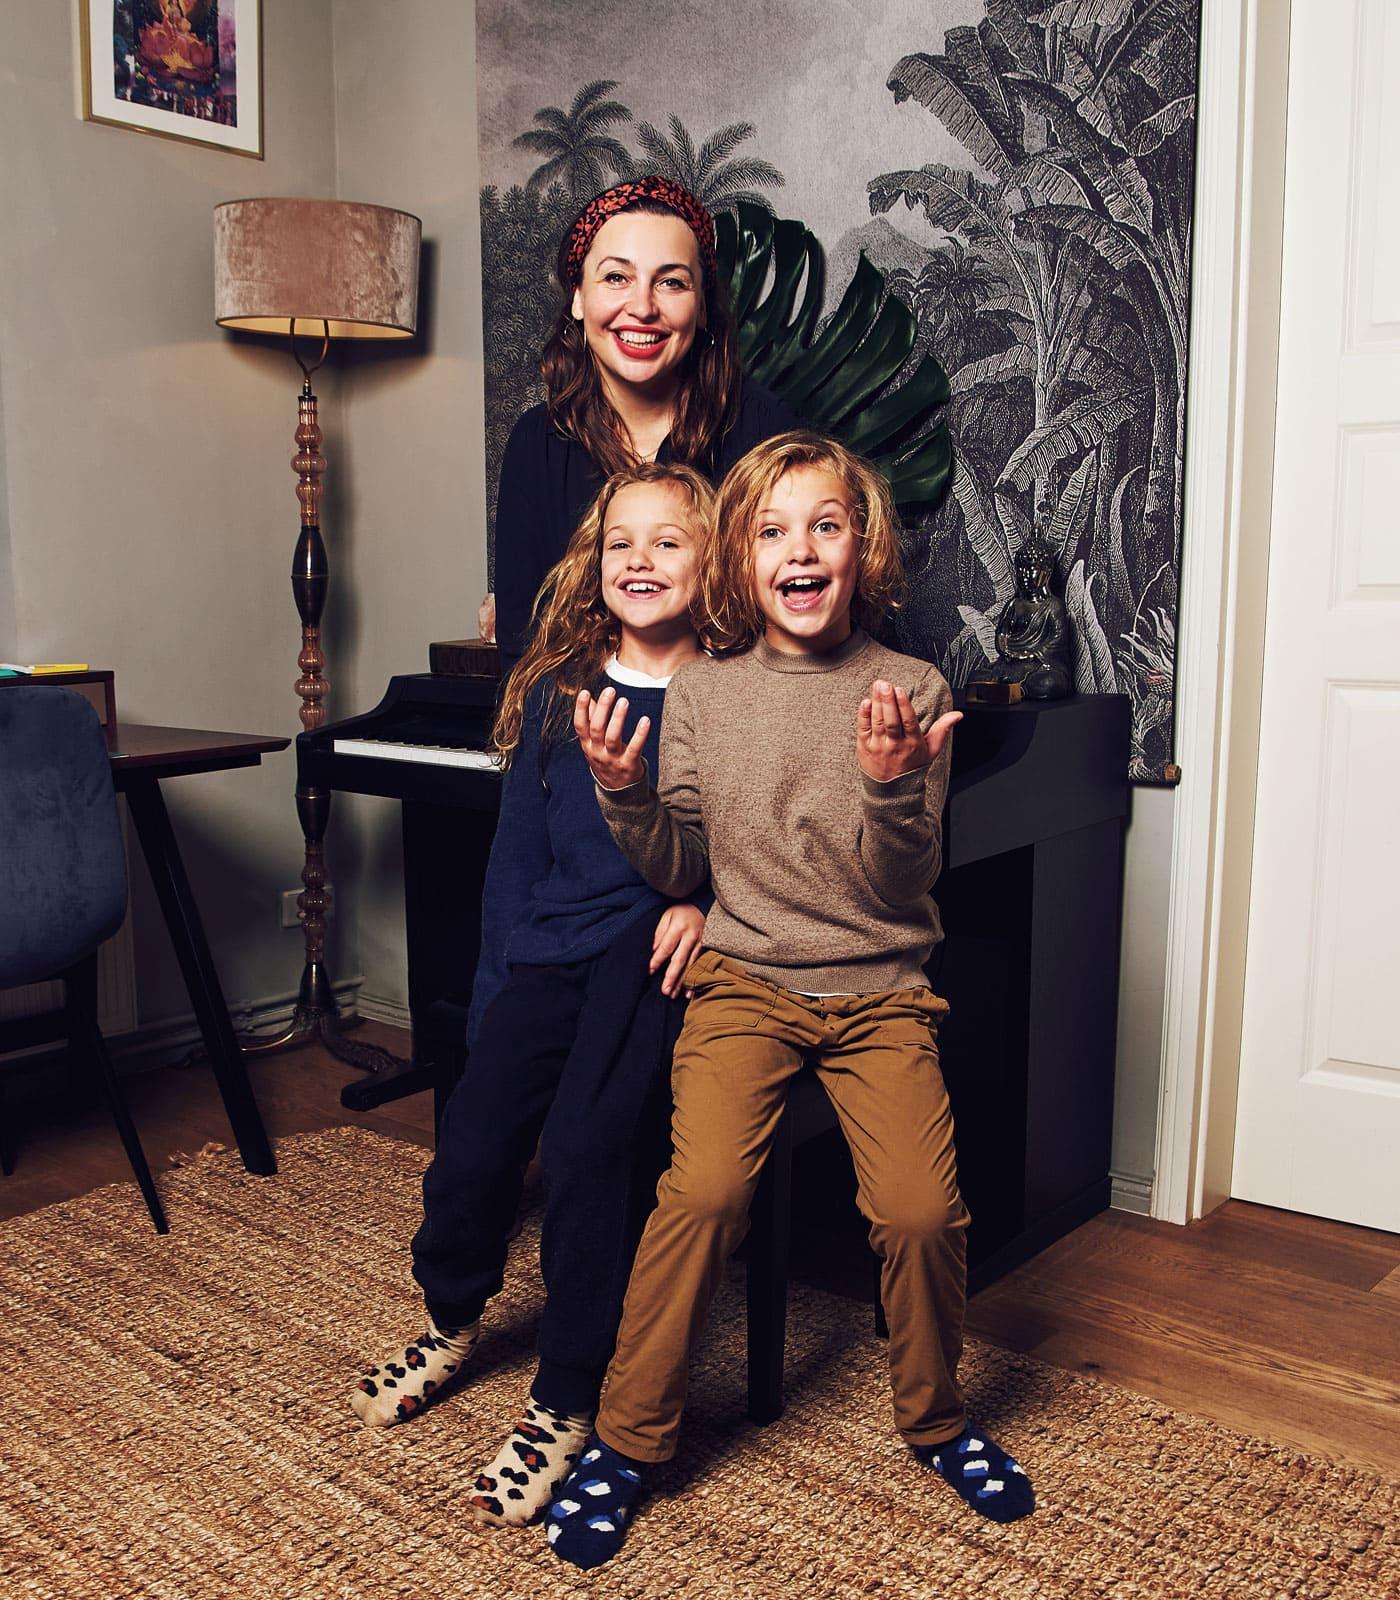 Vom Leben mit Zwillingen: Doppelte Power // HIMBEER